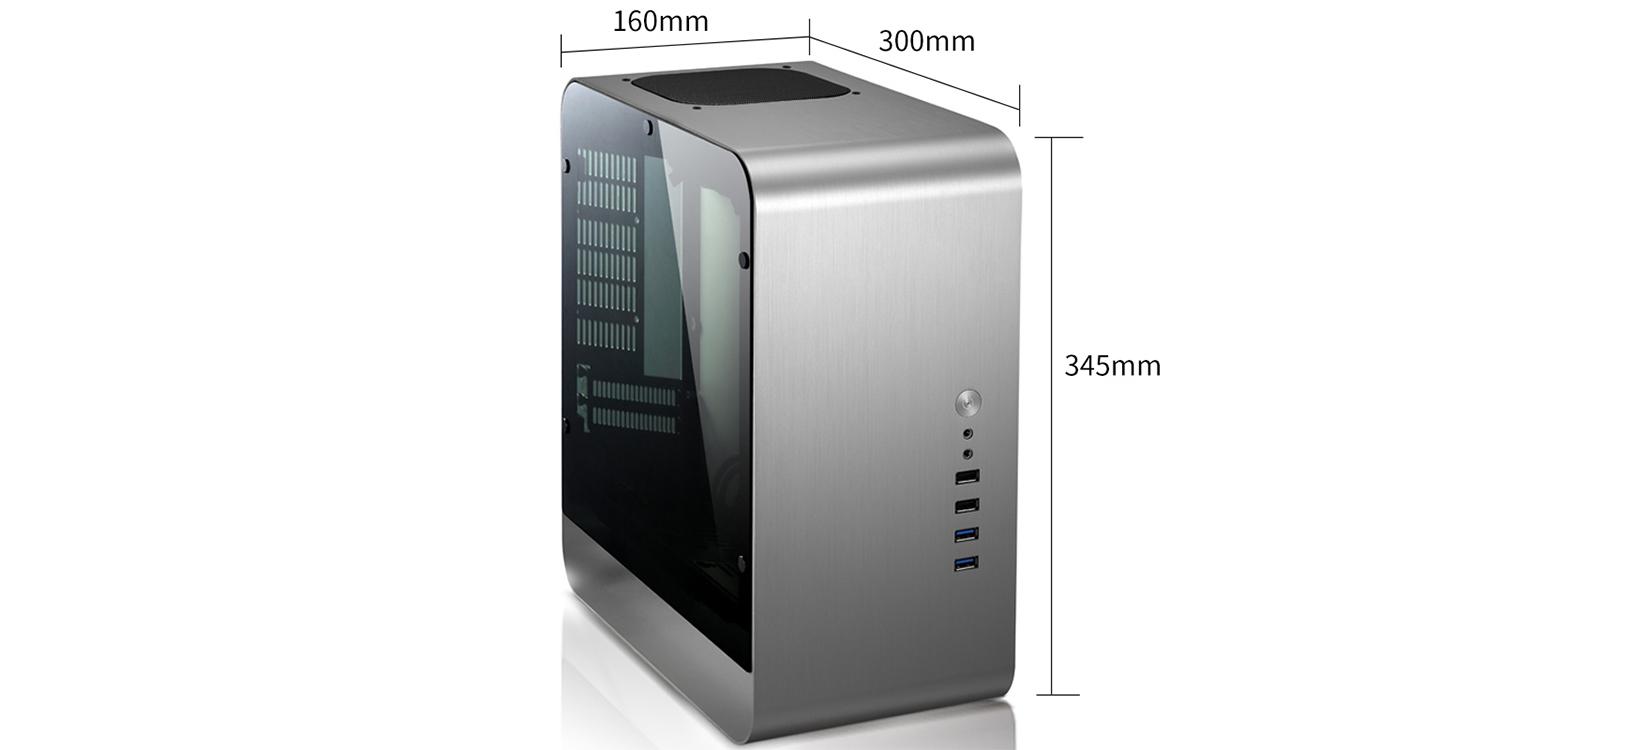 Jonsbo UMX1-PLUS Tempered Glass (Mini Tower/Màu Bạc) giới thiệu 2